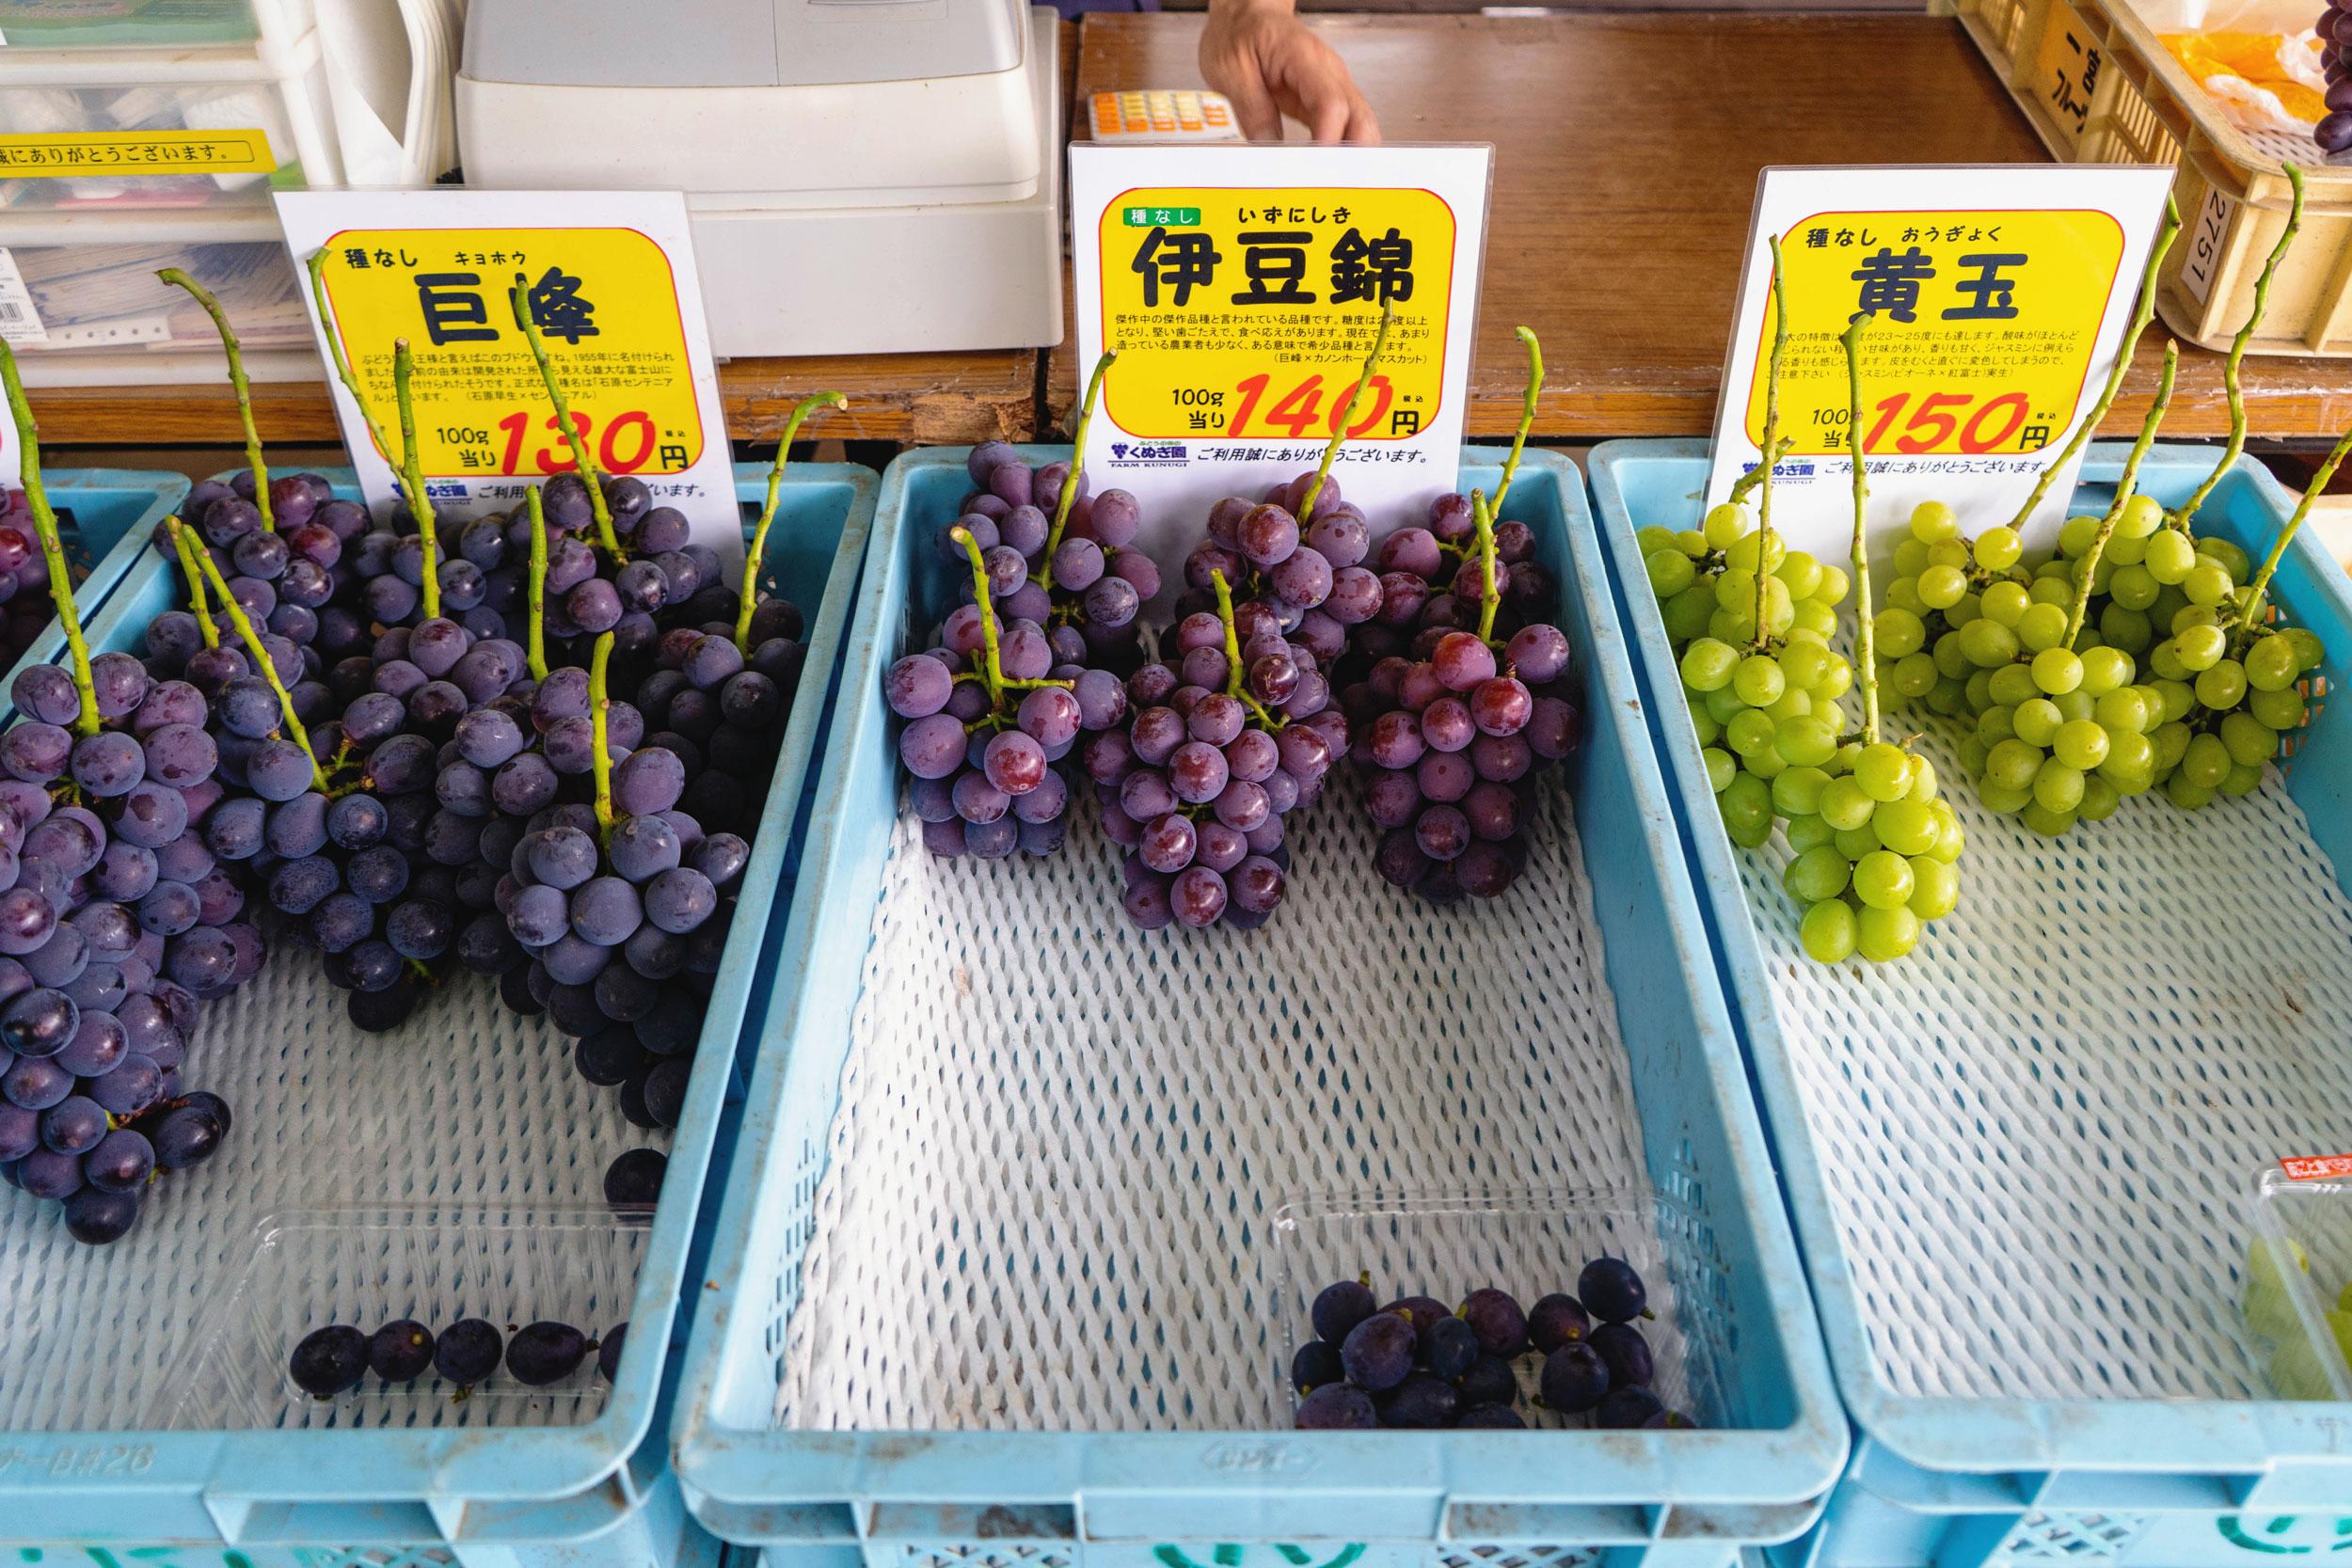 yamanashi-grapes-08.jpg